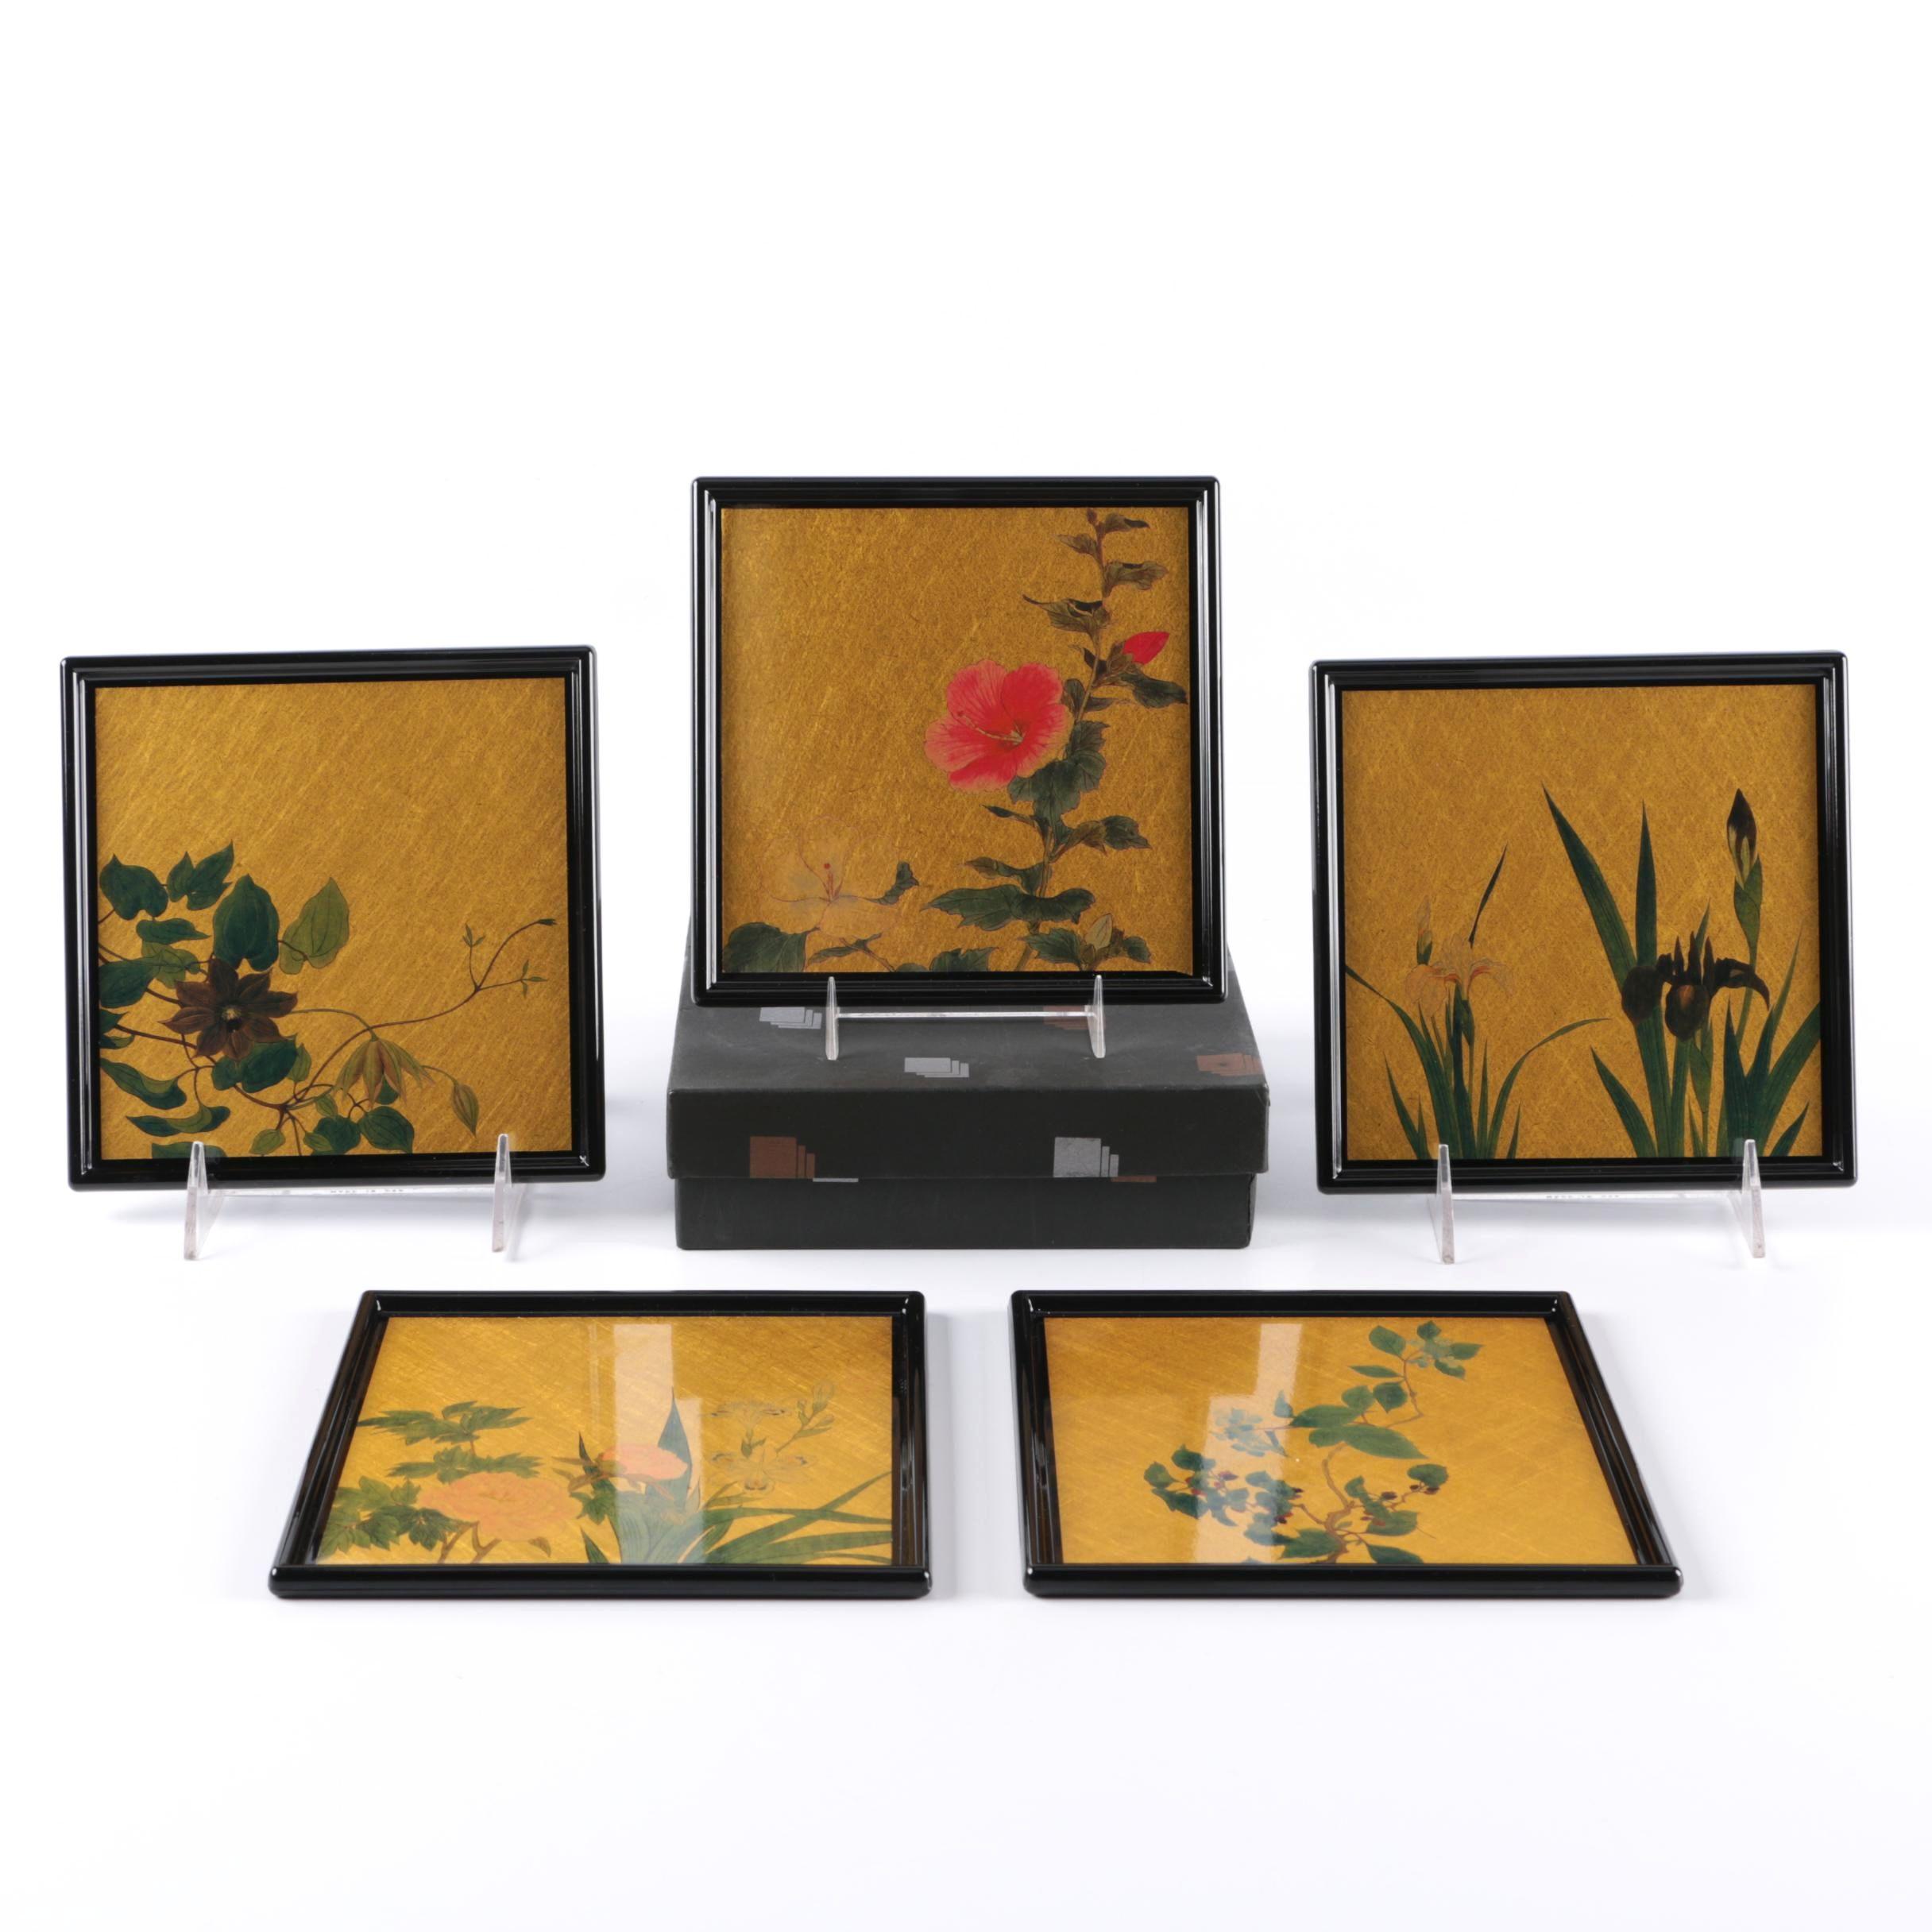 Japanese Hakuichi Original Set of 5 Gold Leaf Square Trays Plates NOS